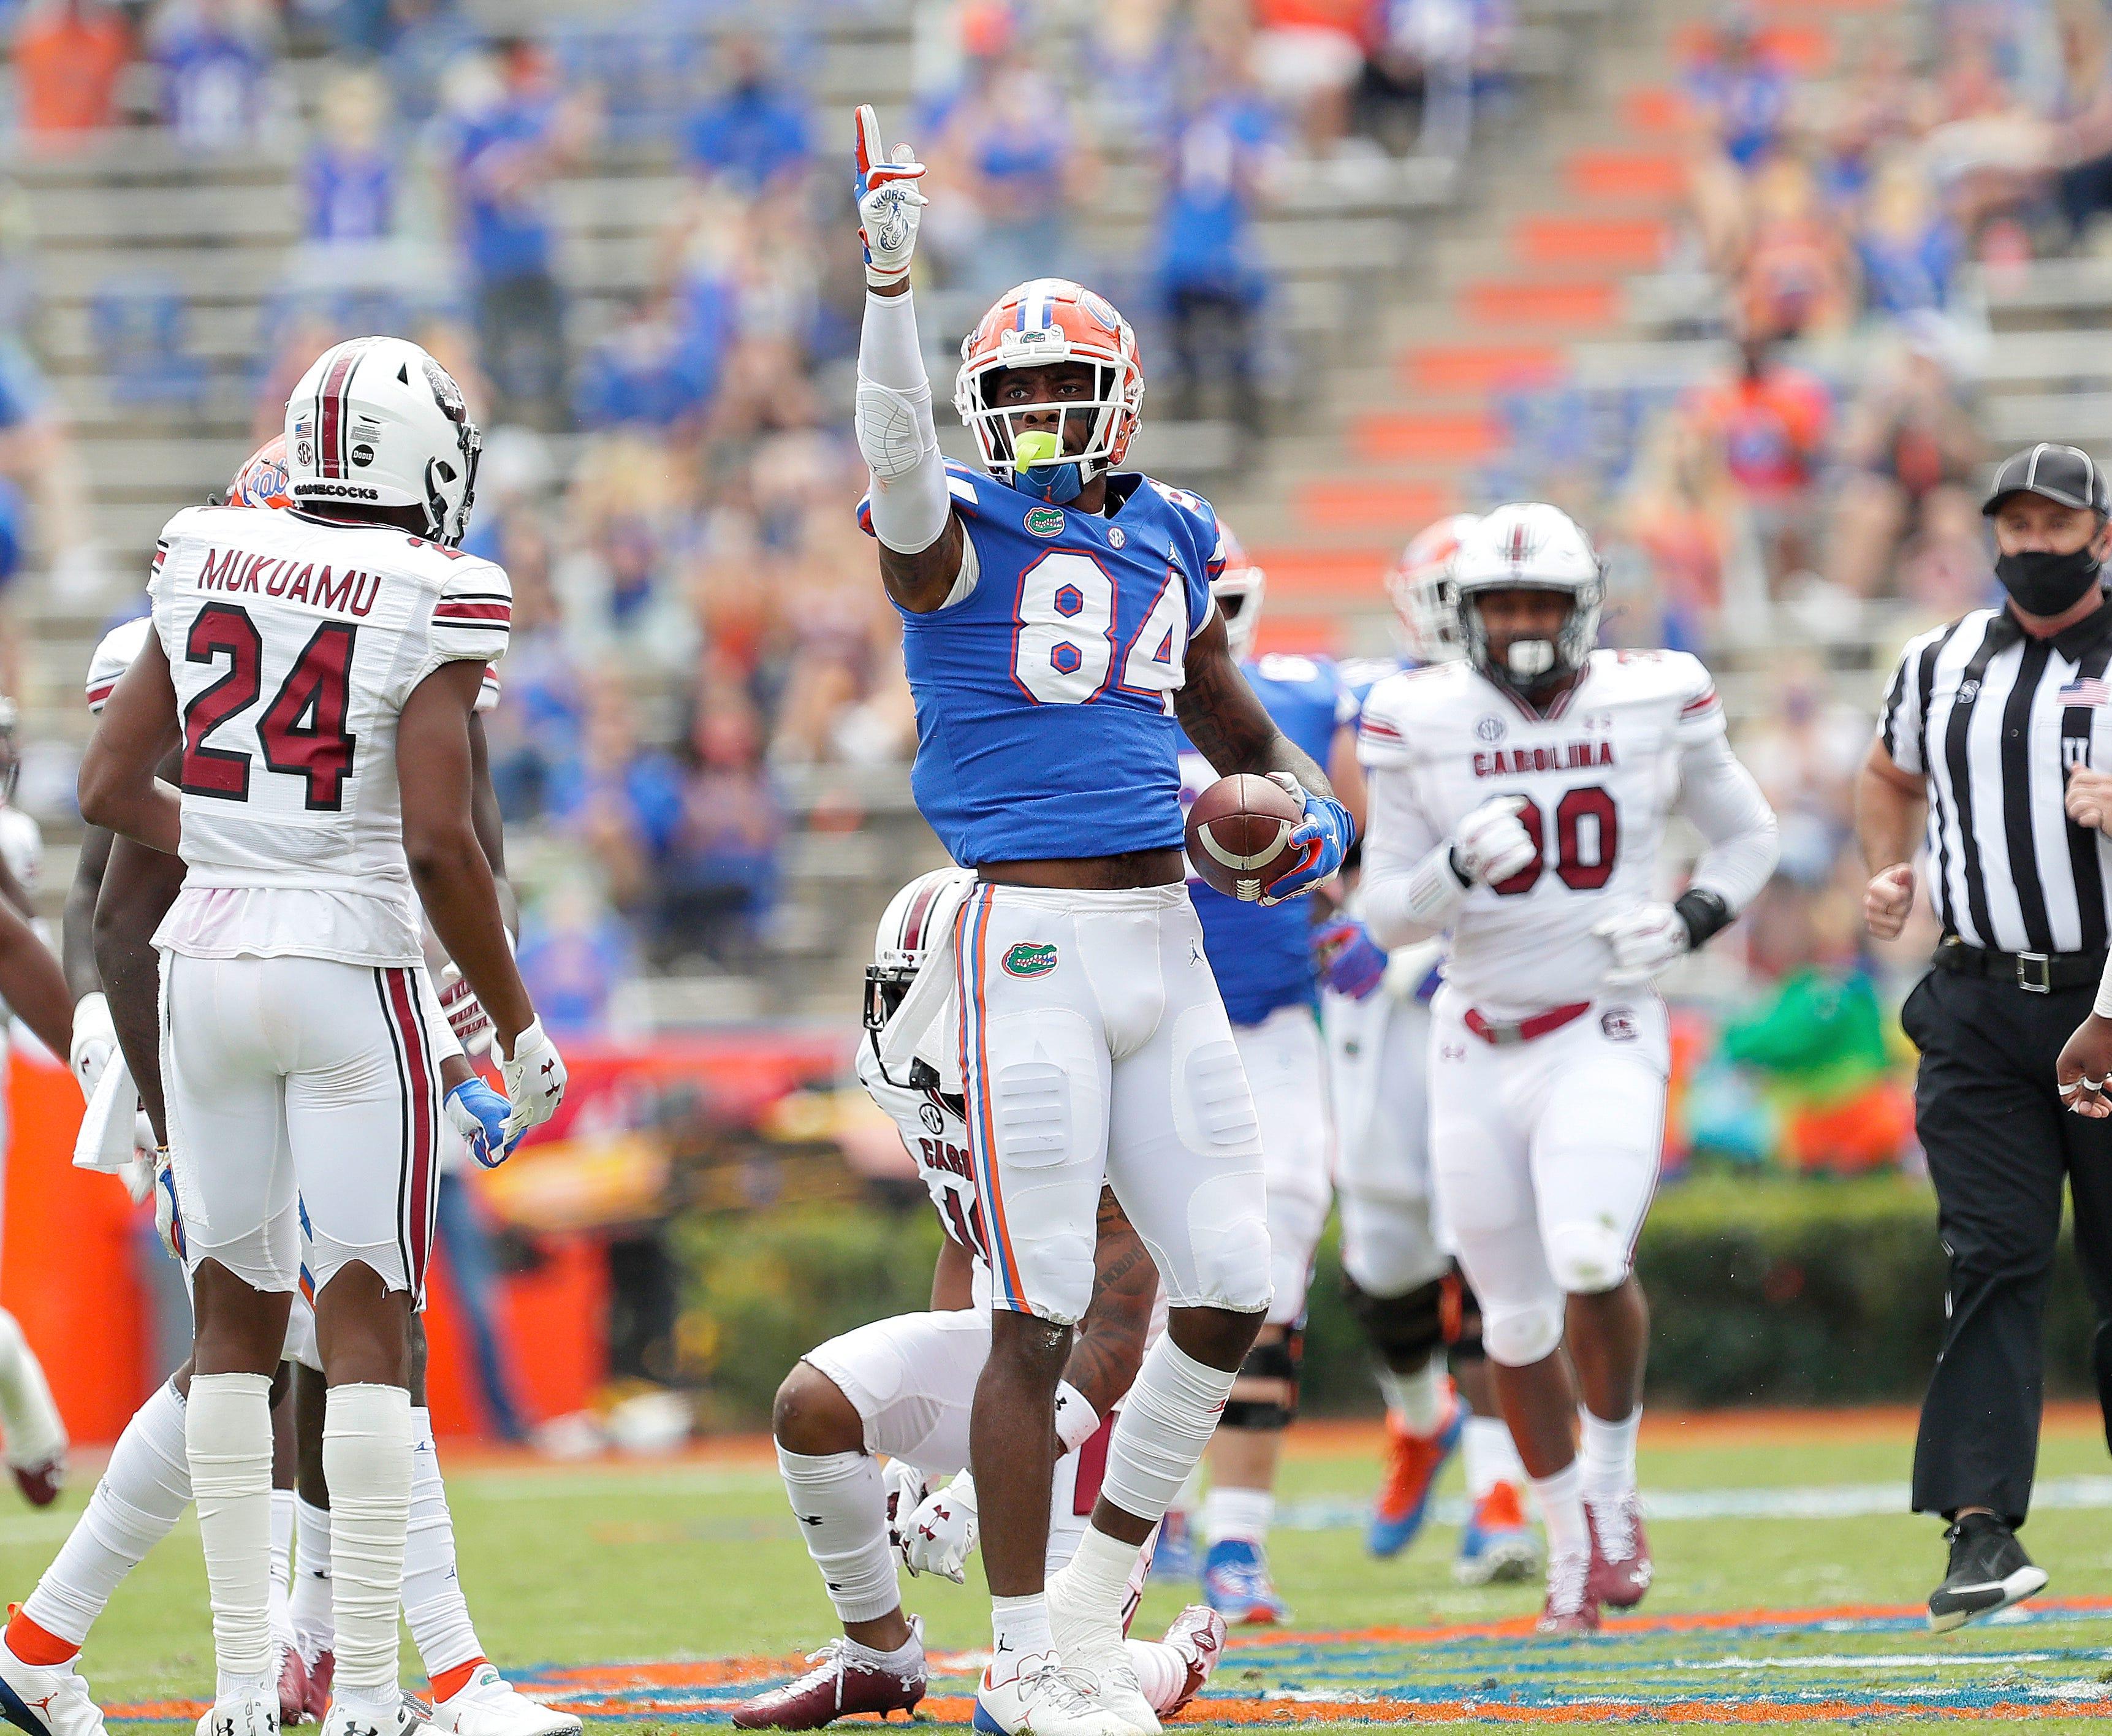 No. 3 Florida keeps rolling with defeat of South Carolina